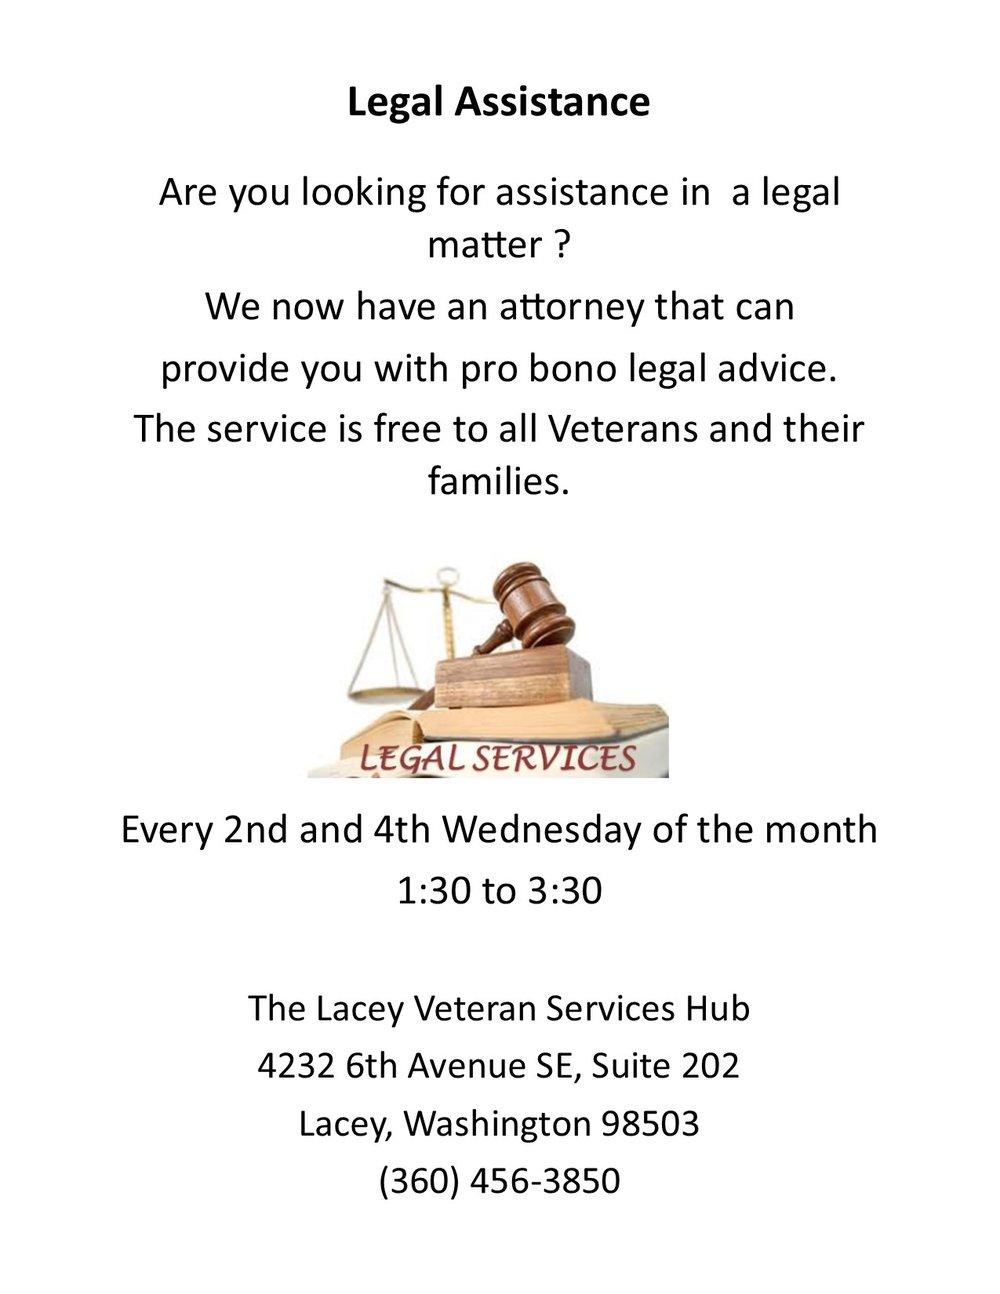 Legal Assistance Flyer.jpg